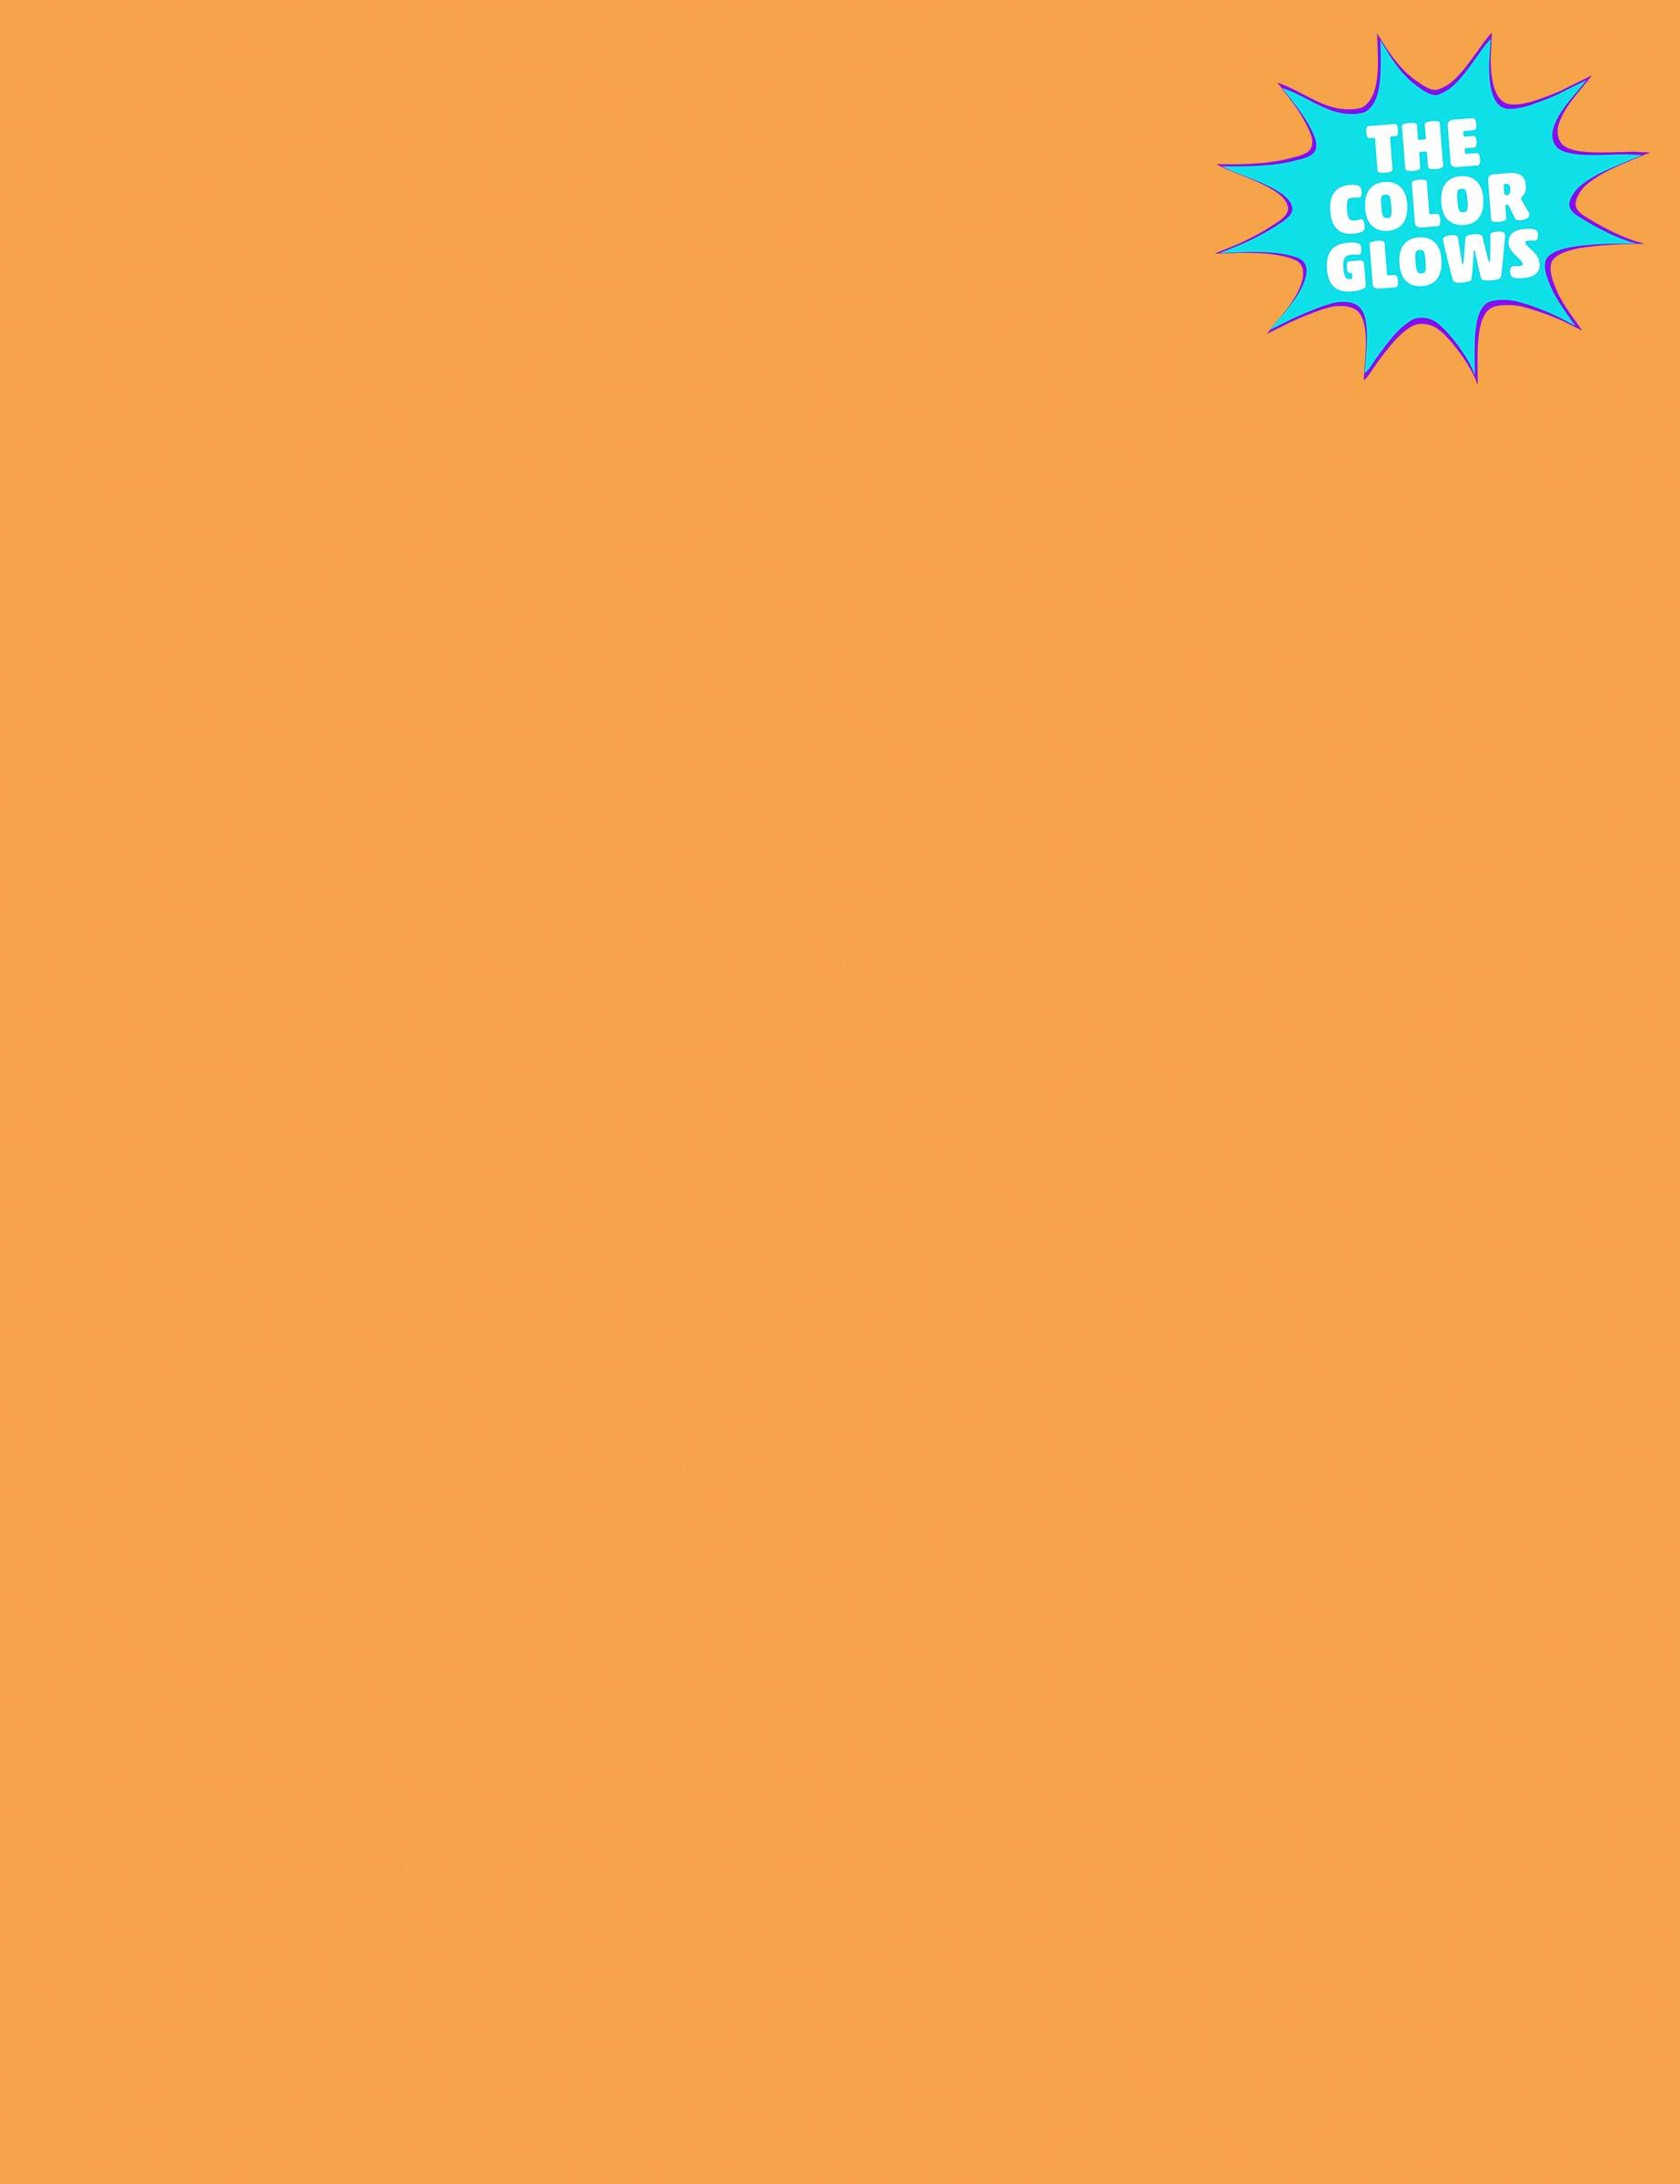 Kaleidoscope Multi-Purpose Paper, 8.5 x 11 Inches, Hyper Orange, 500 Sheets (102218)